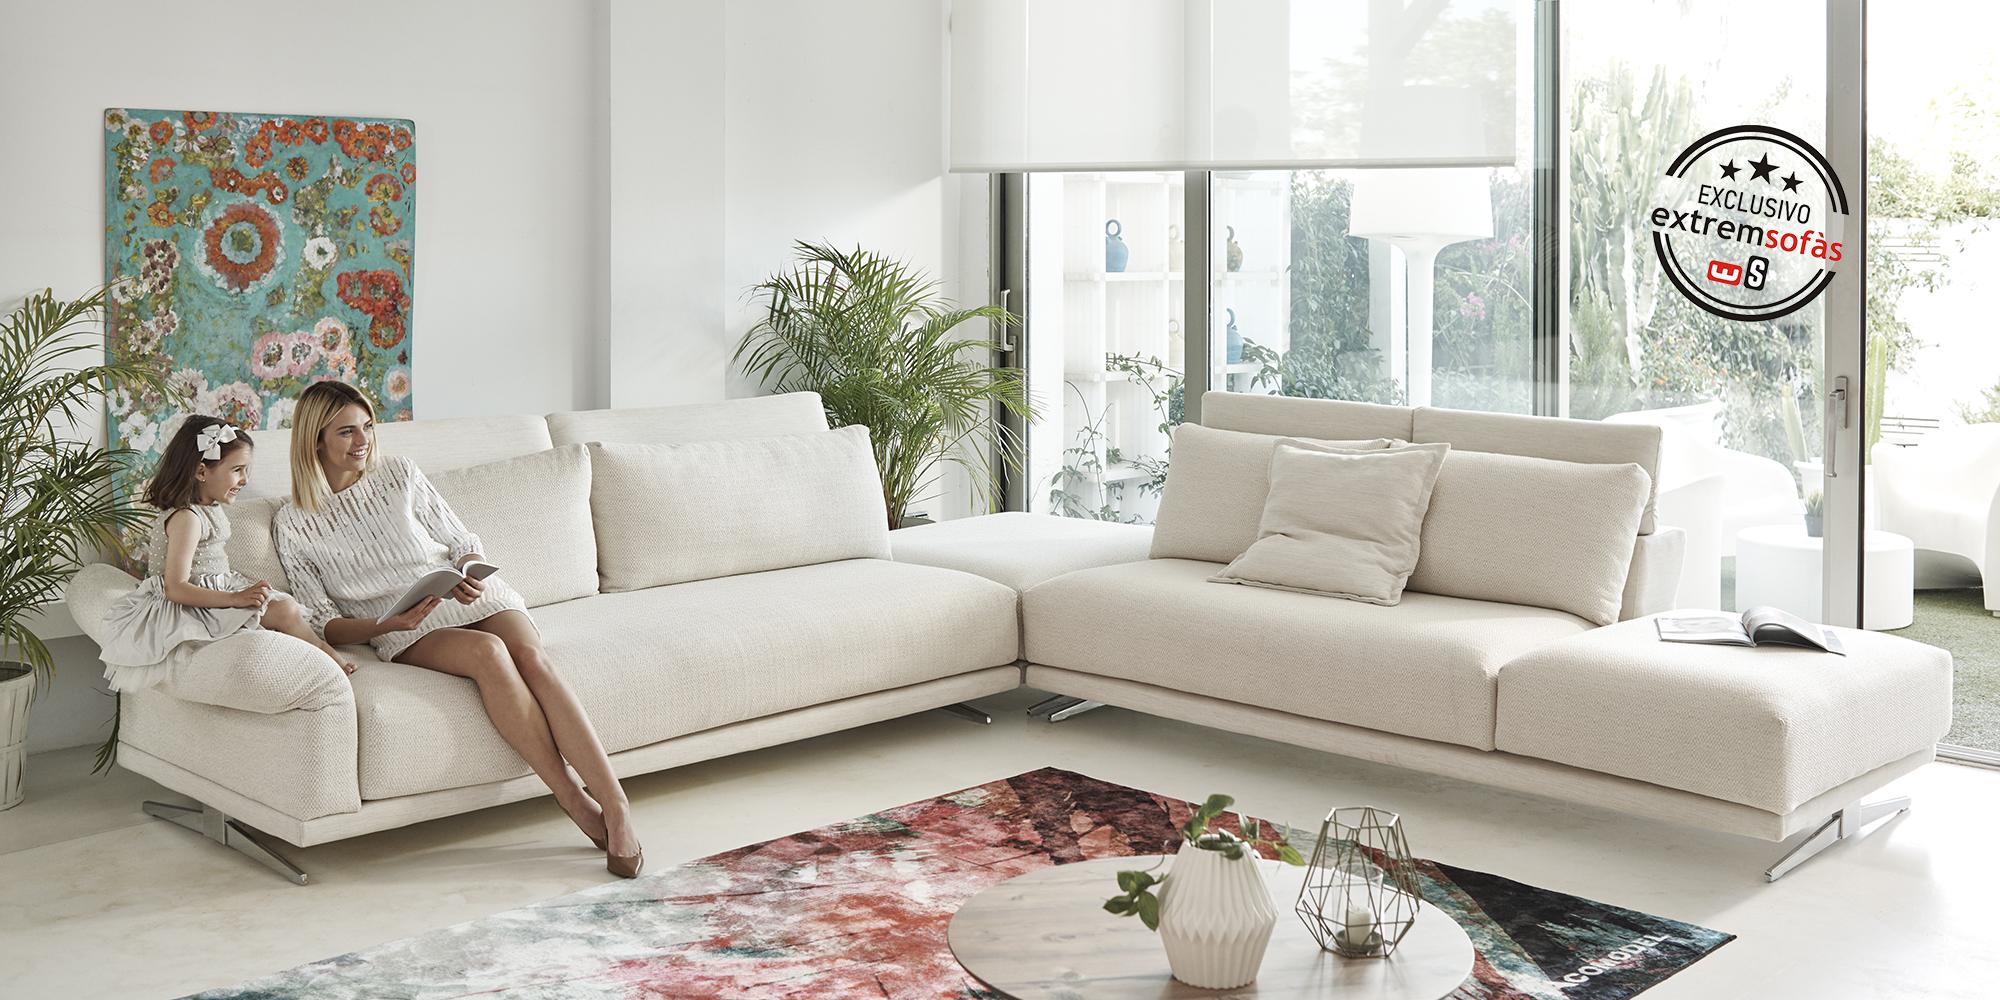 Marcas de sofas de piel free landskrona sof plazas grann - Marcas de sofas de piel ...